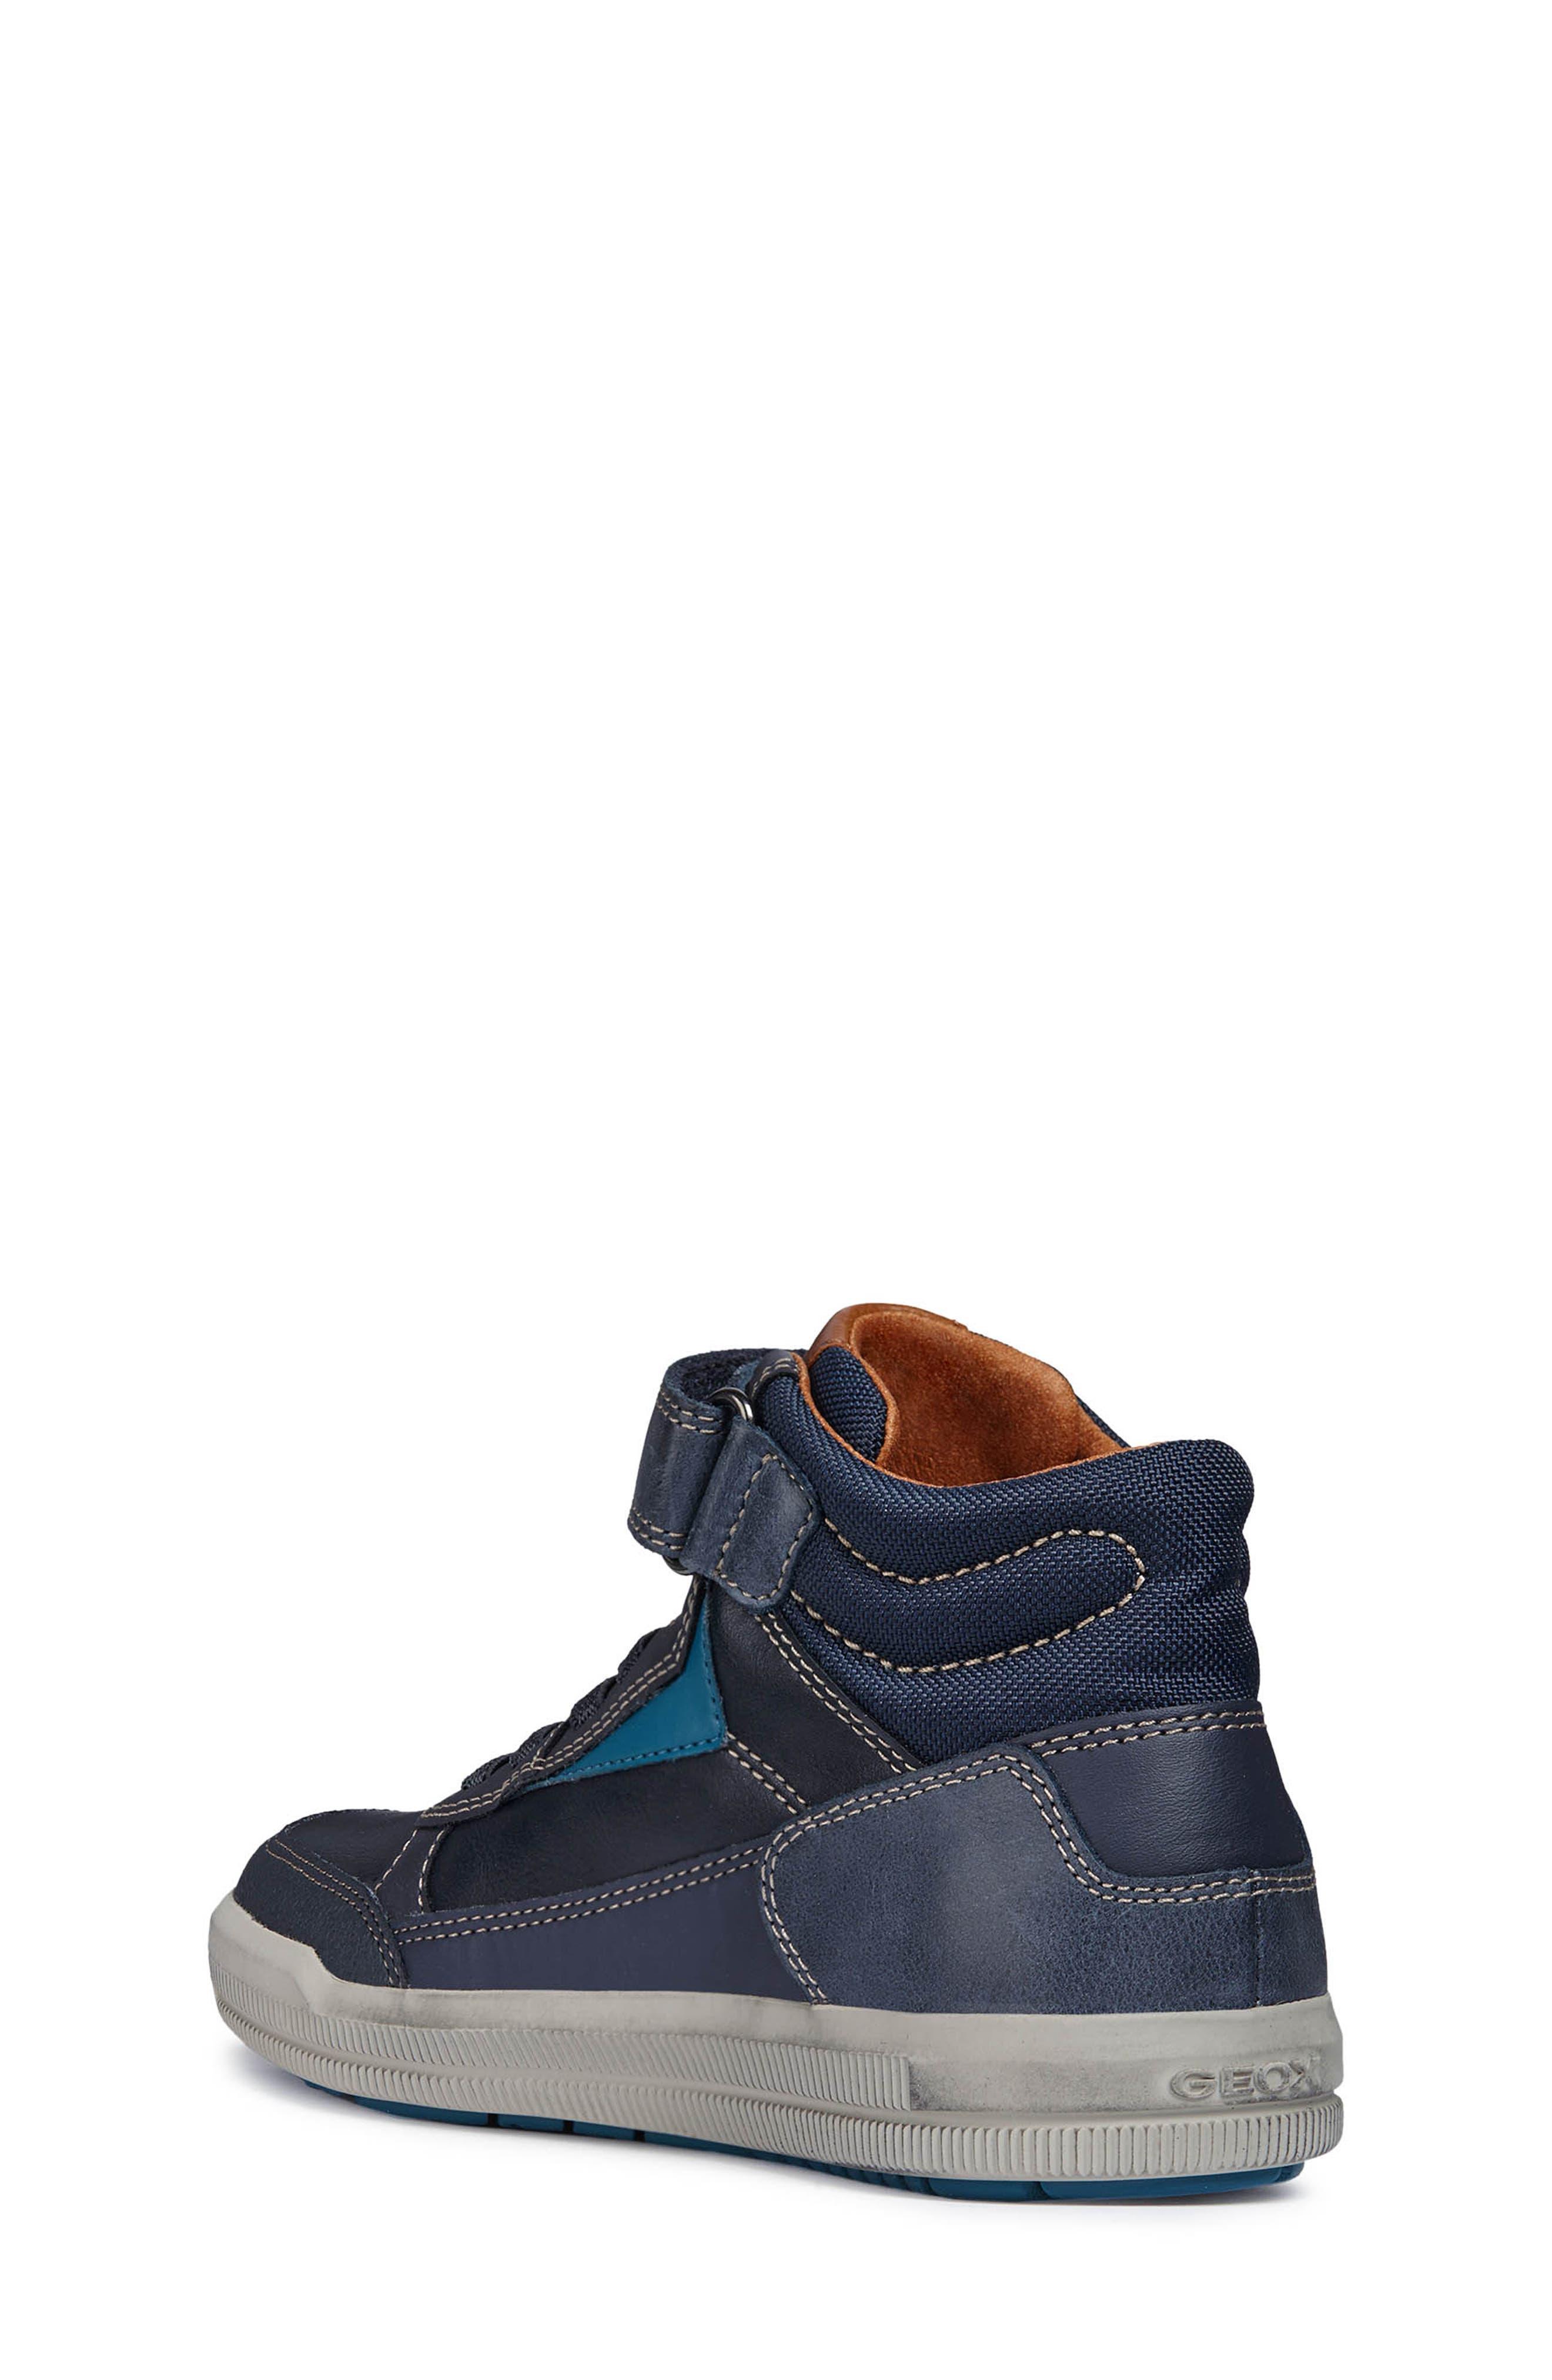 Arzach Mid Top Sneaker,                             Alternate thumbnail 2, color,                             Navy/Petrol